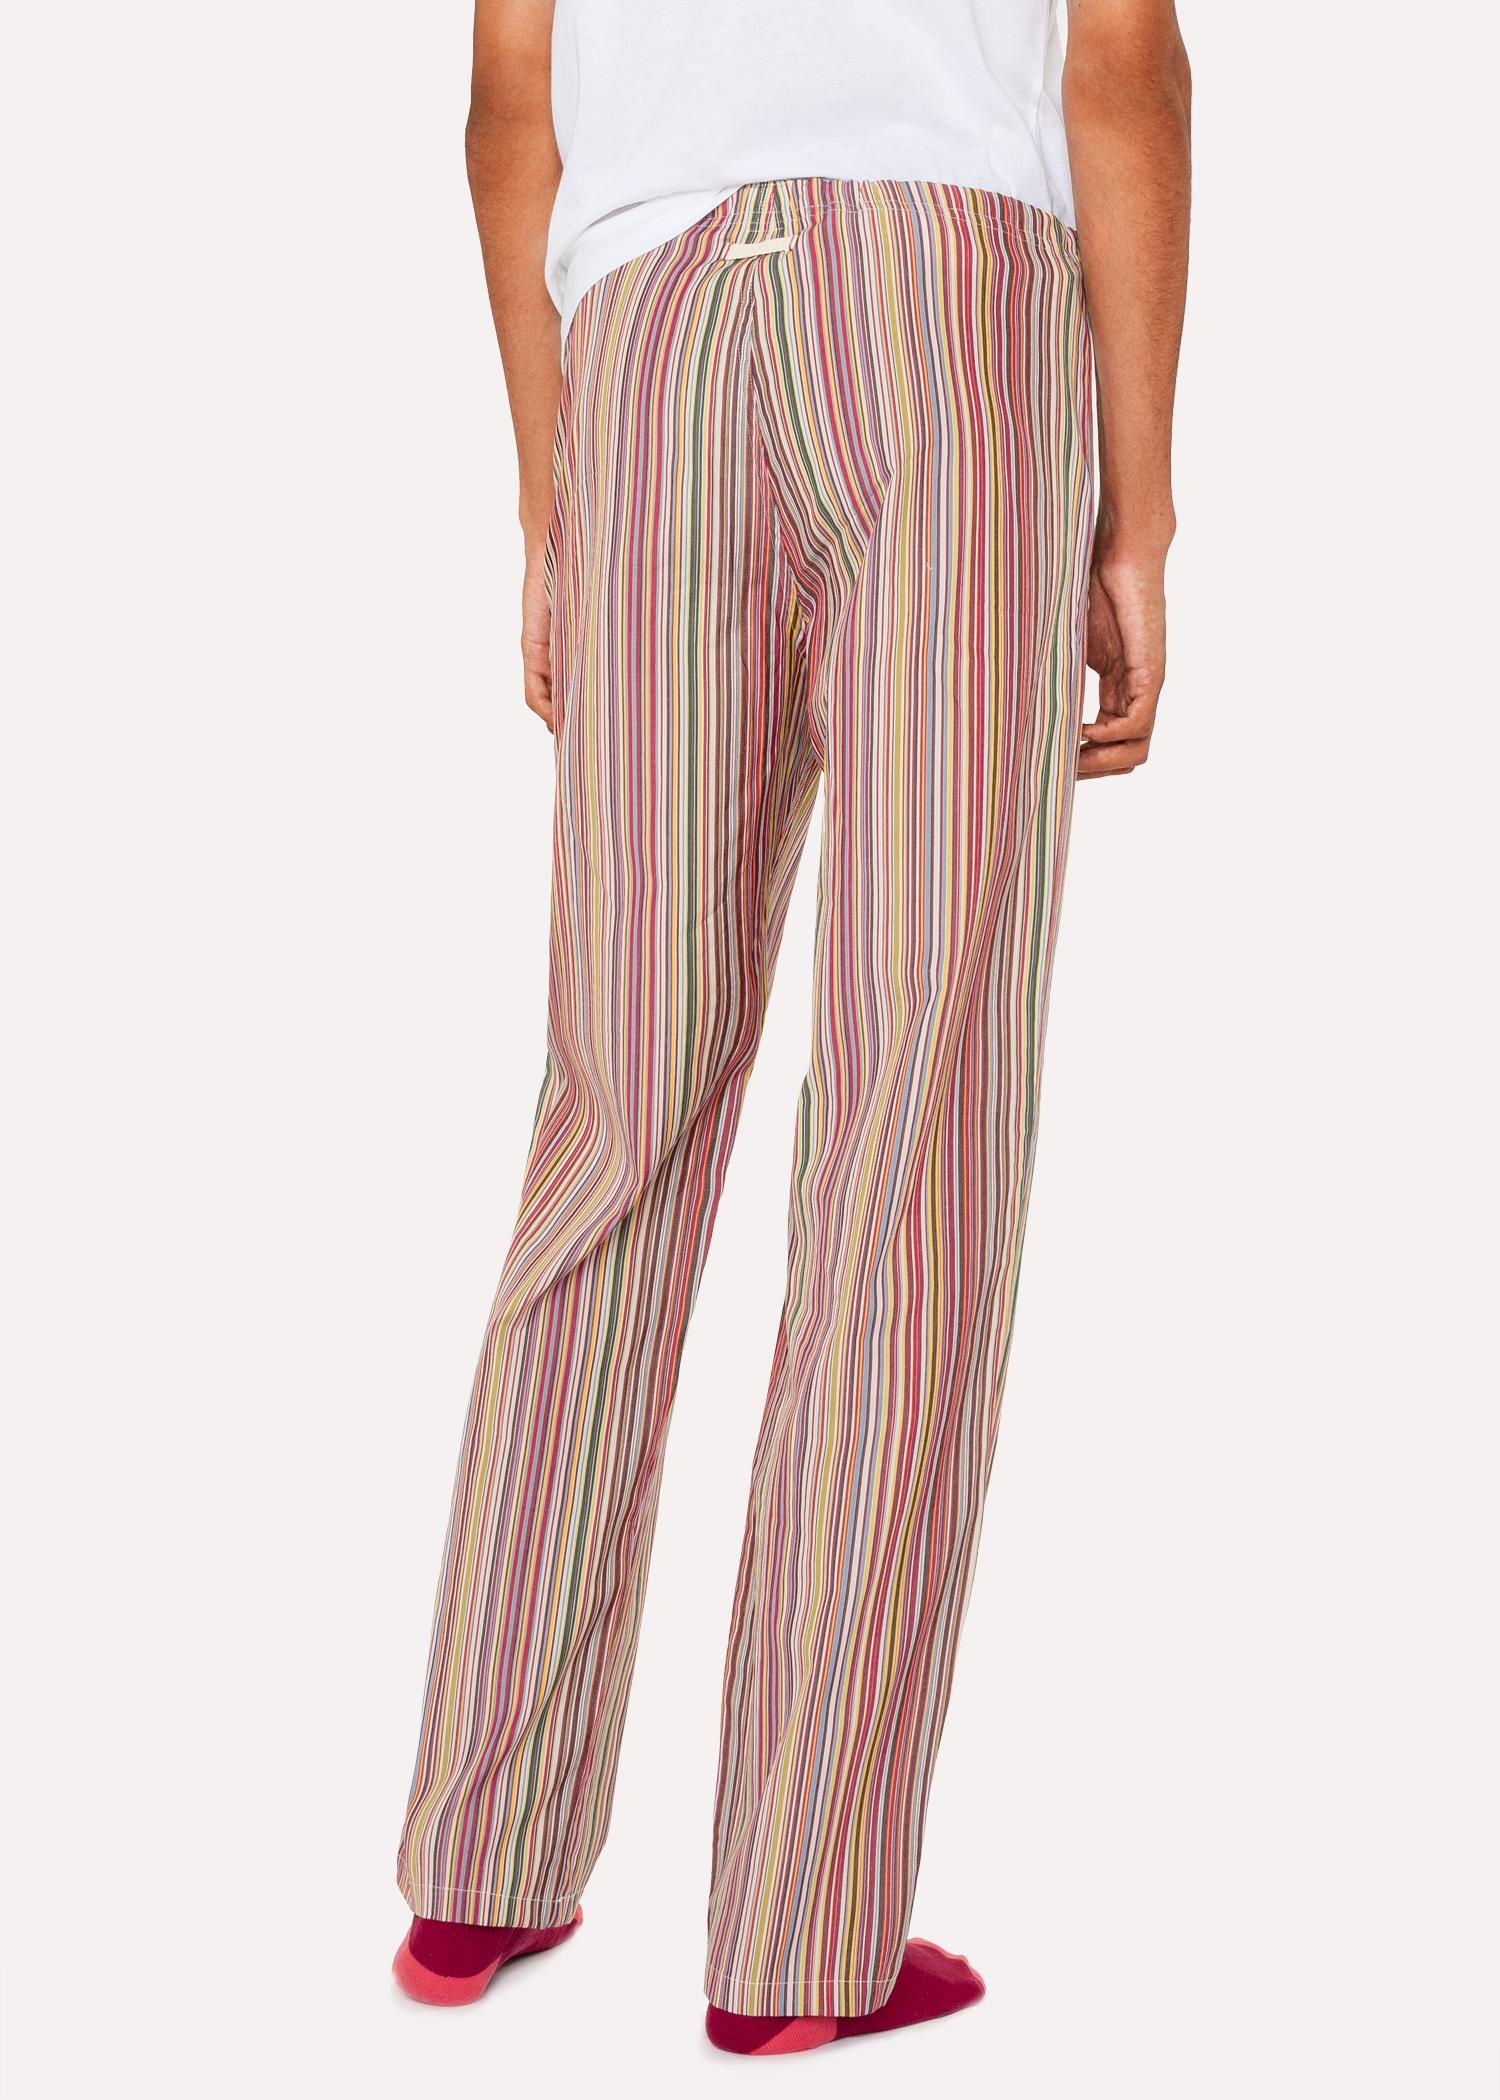 e973c26da Men s Signature Stripe Pyjama Bottoms - Paul Smith